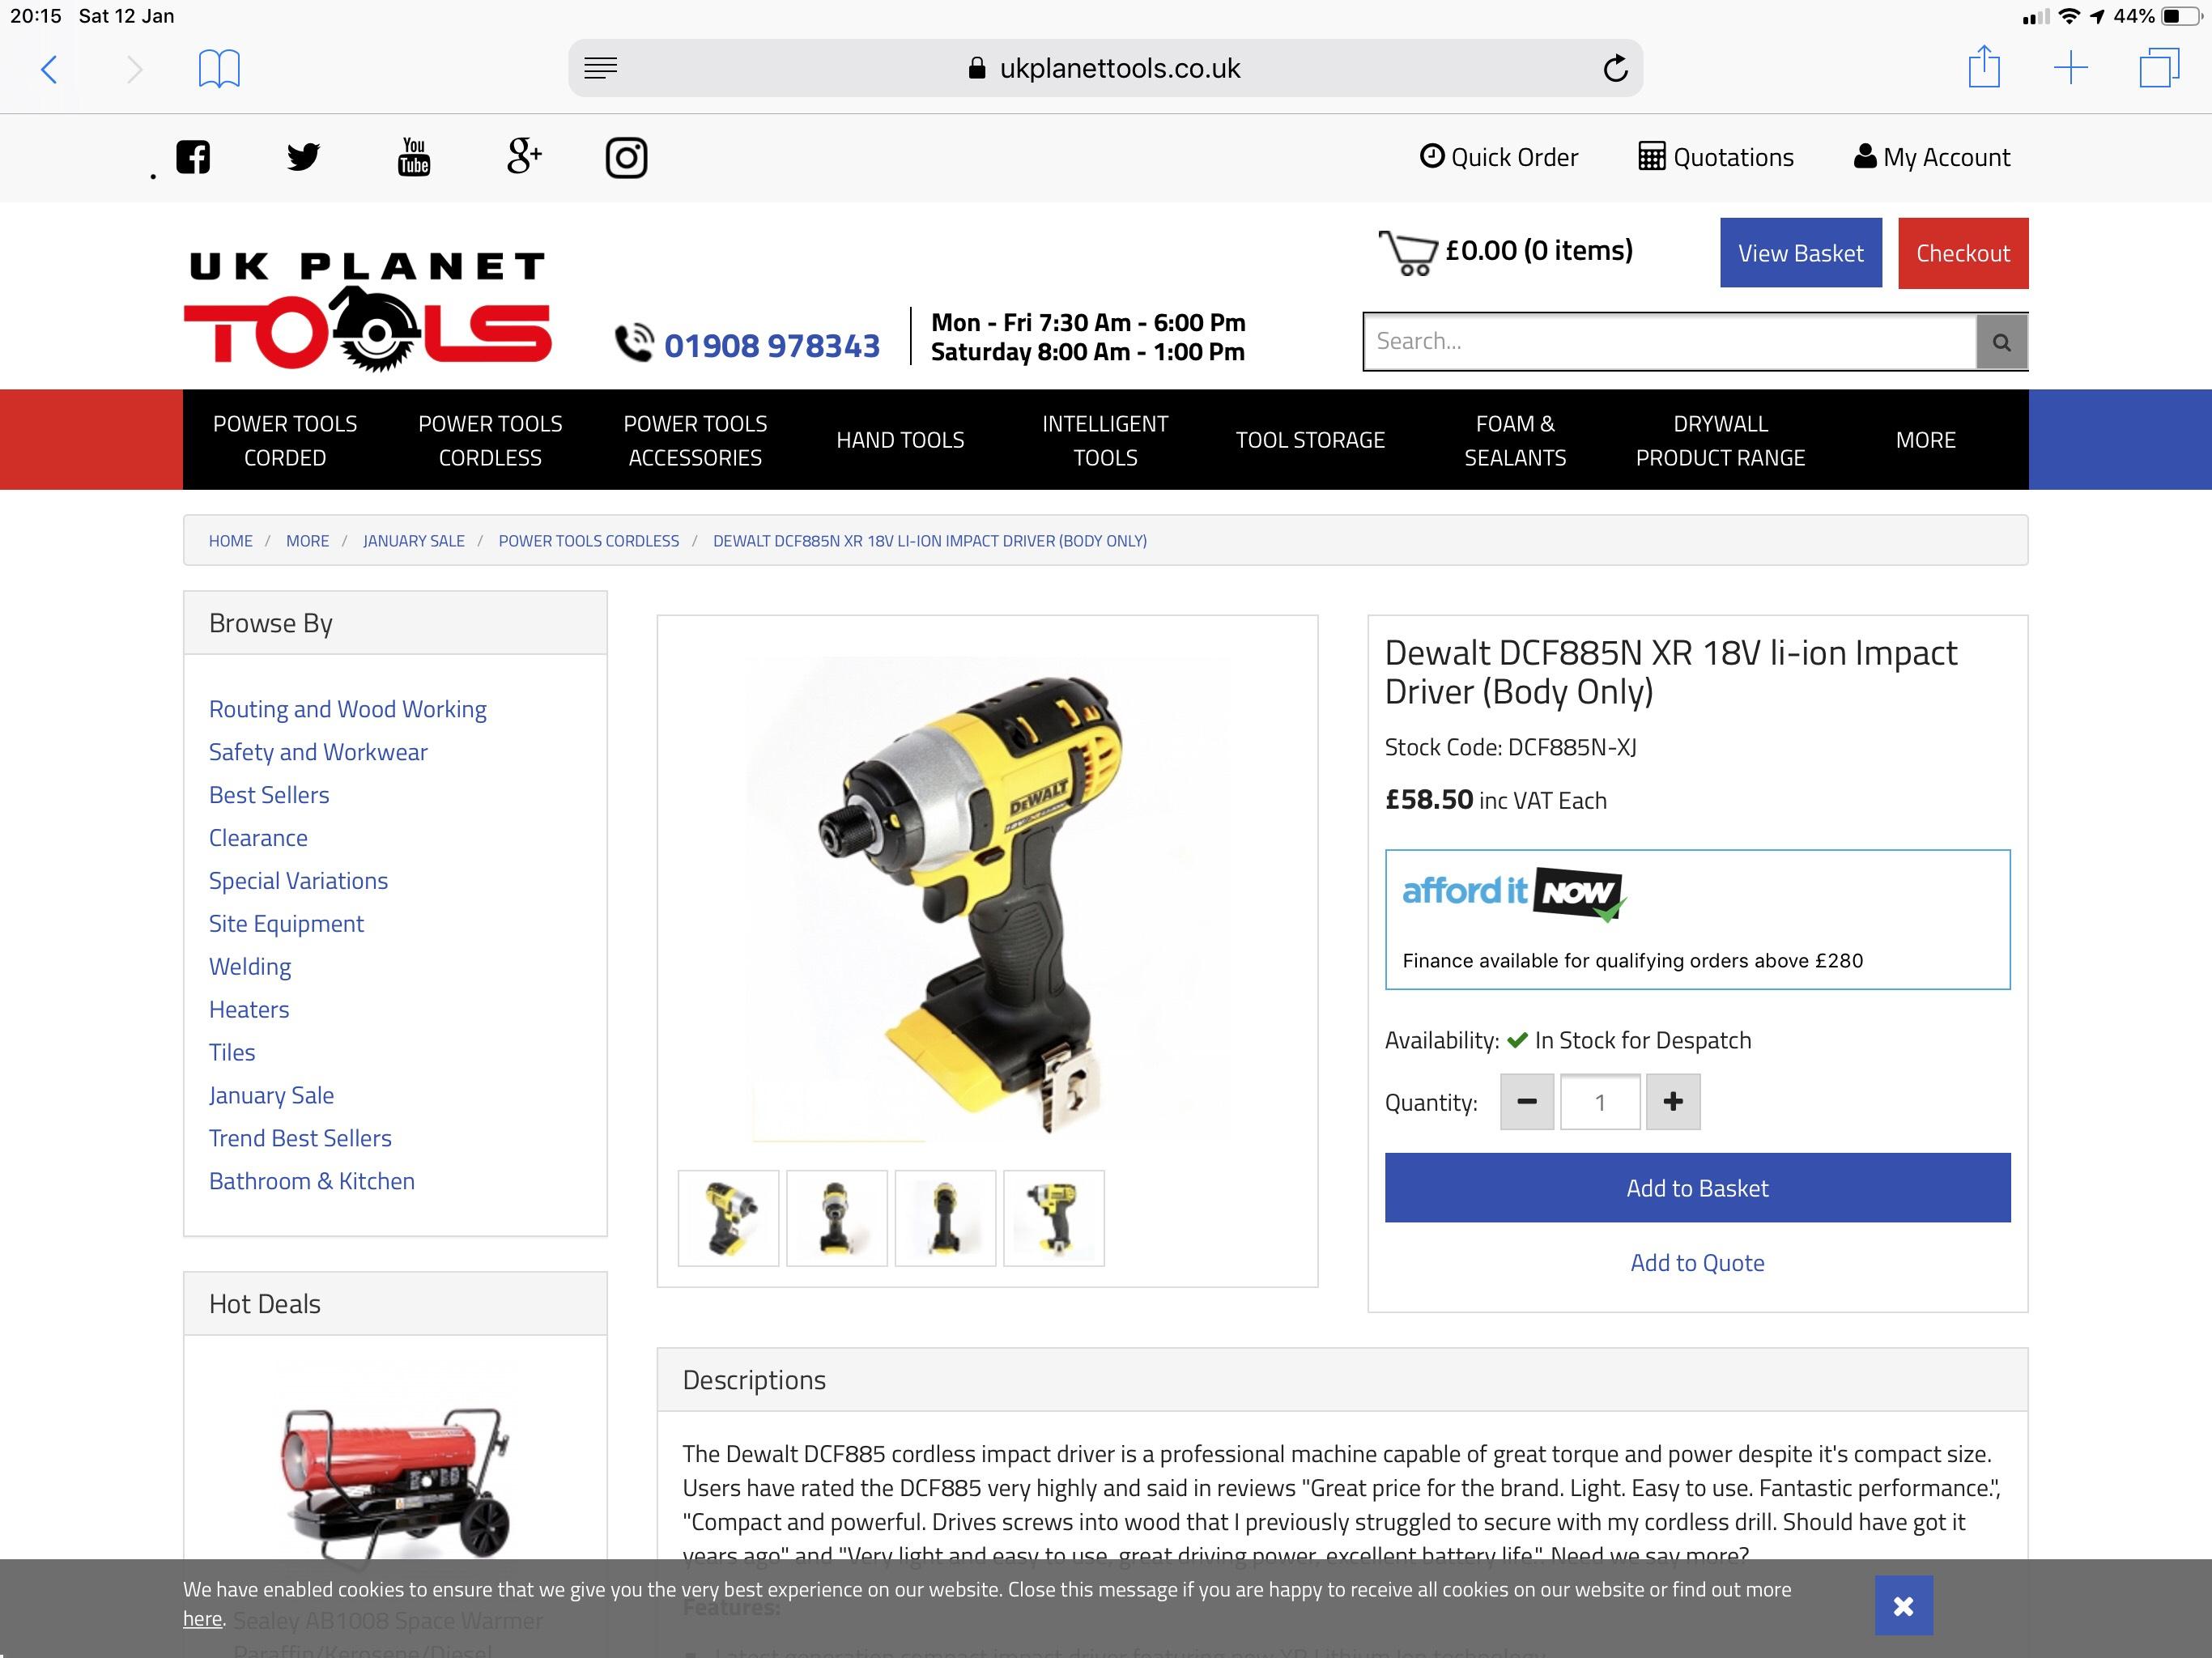 Dewalt DCF885N XR 18V li-ion Impact Driver (Body Only) - £58.50 @ UK Planet Tools